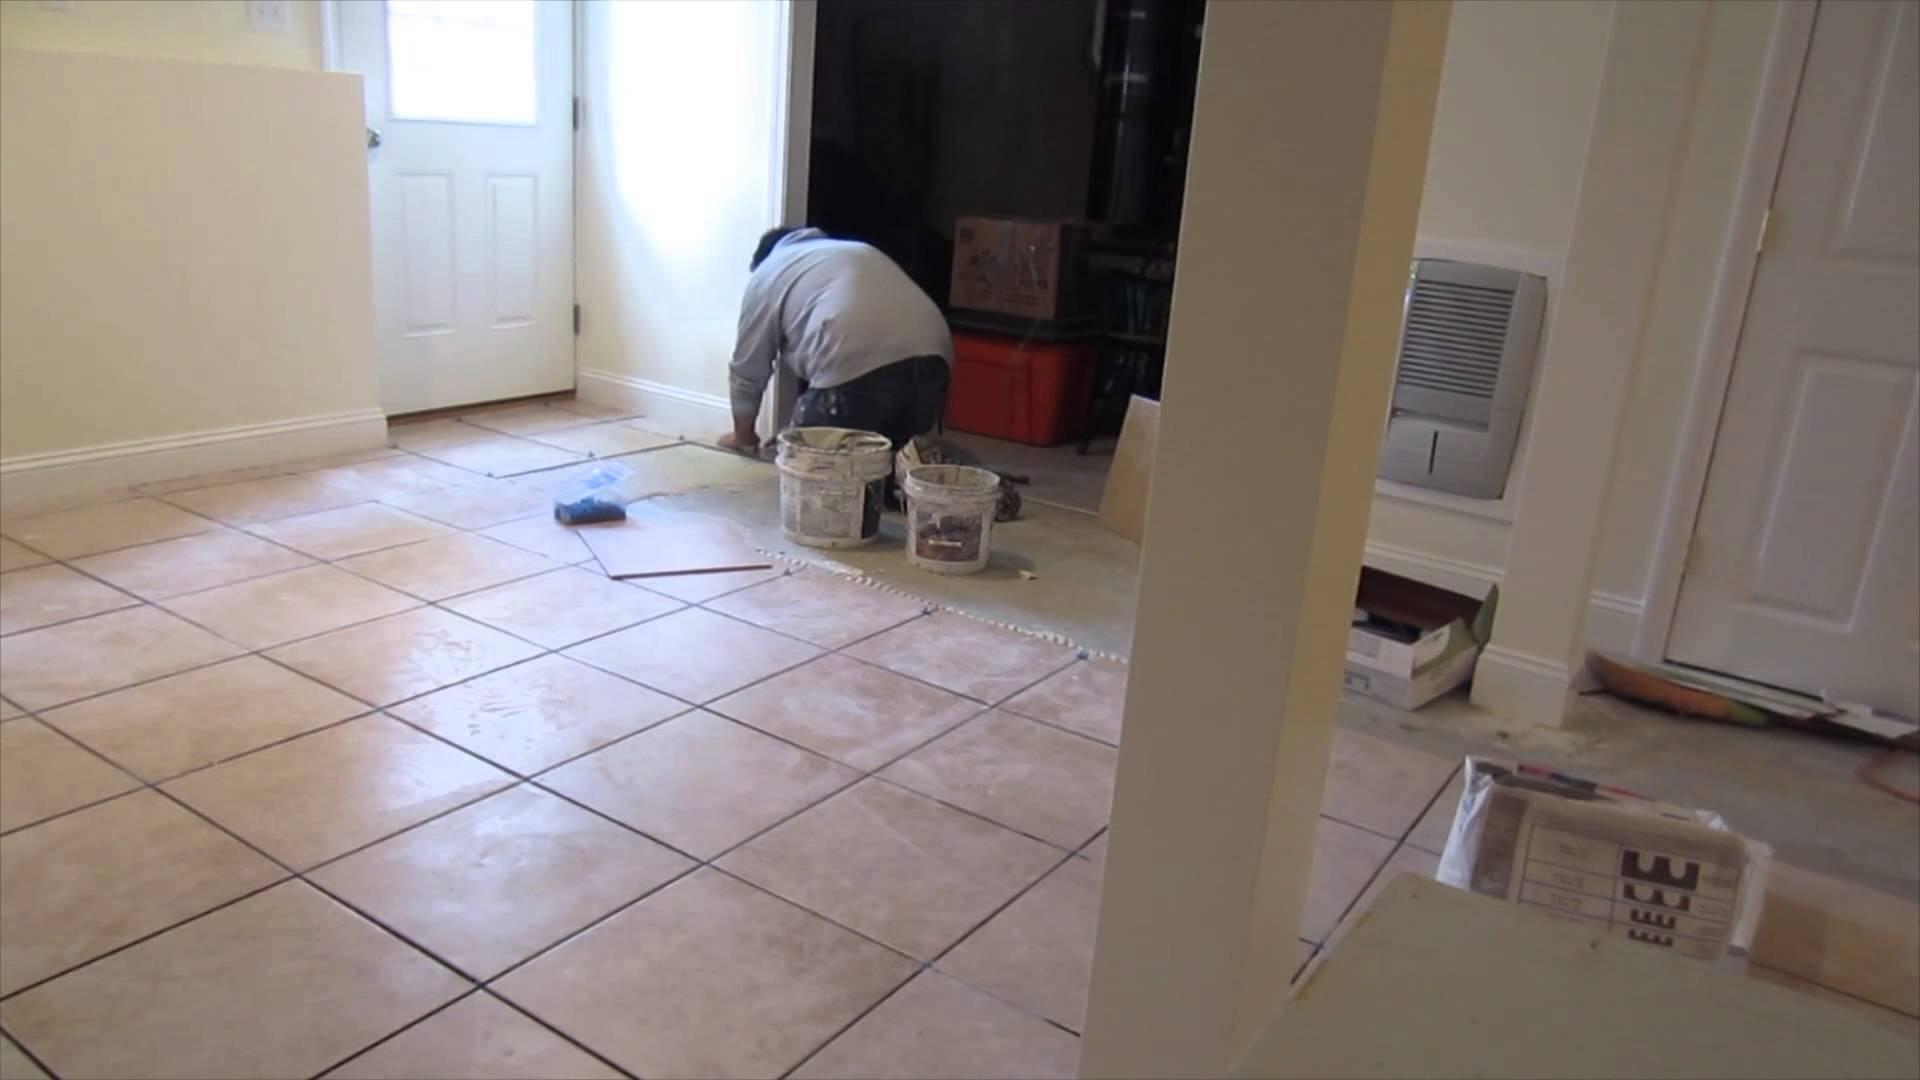 Ceramic Tile Over Concrete Basement Floor